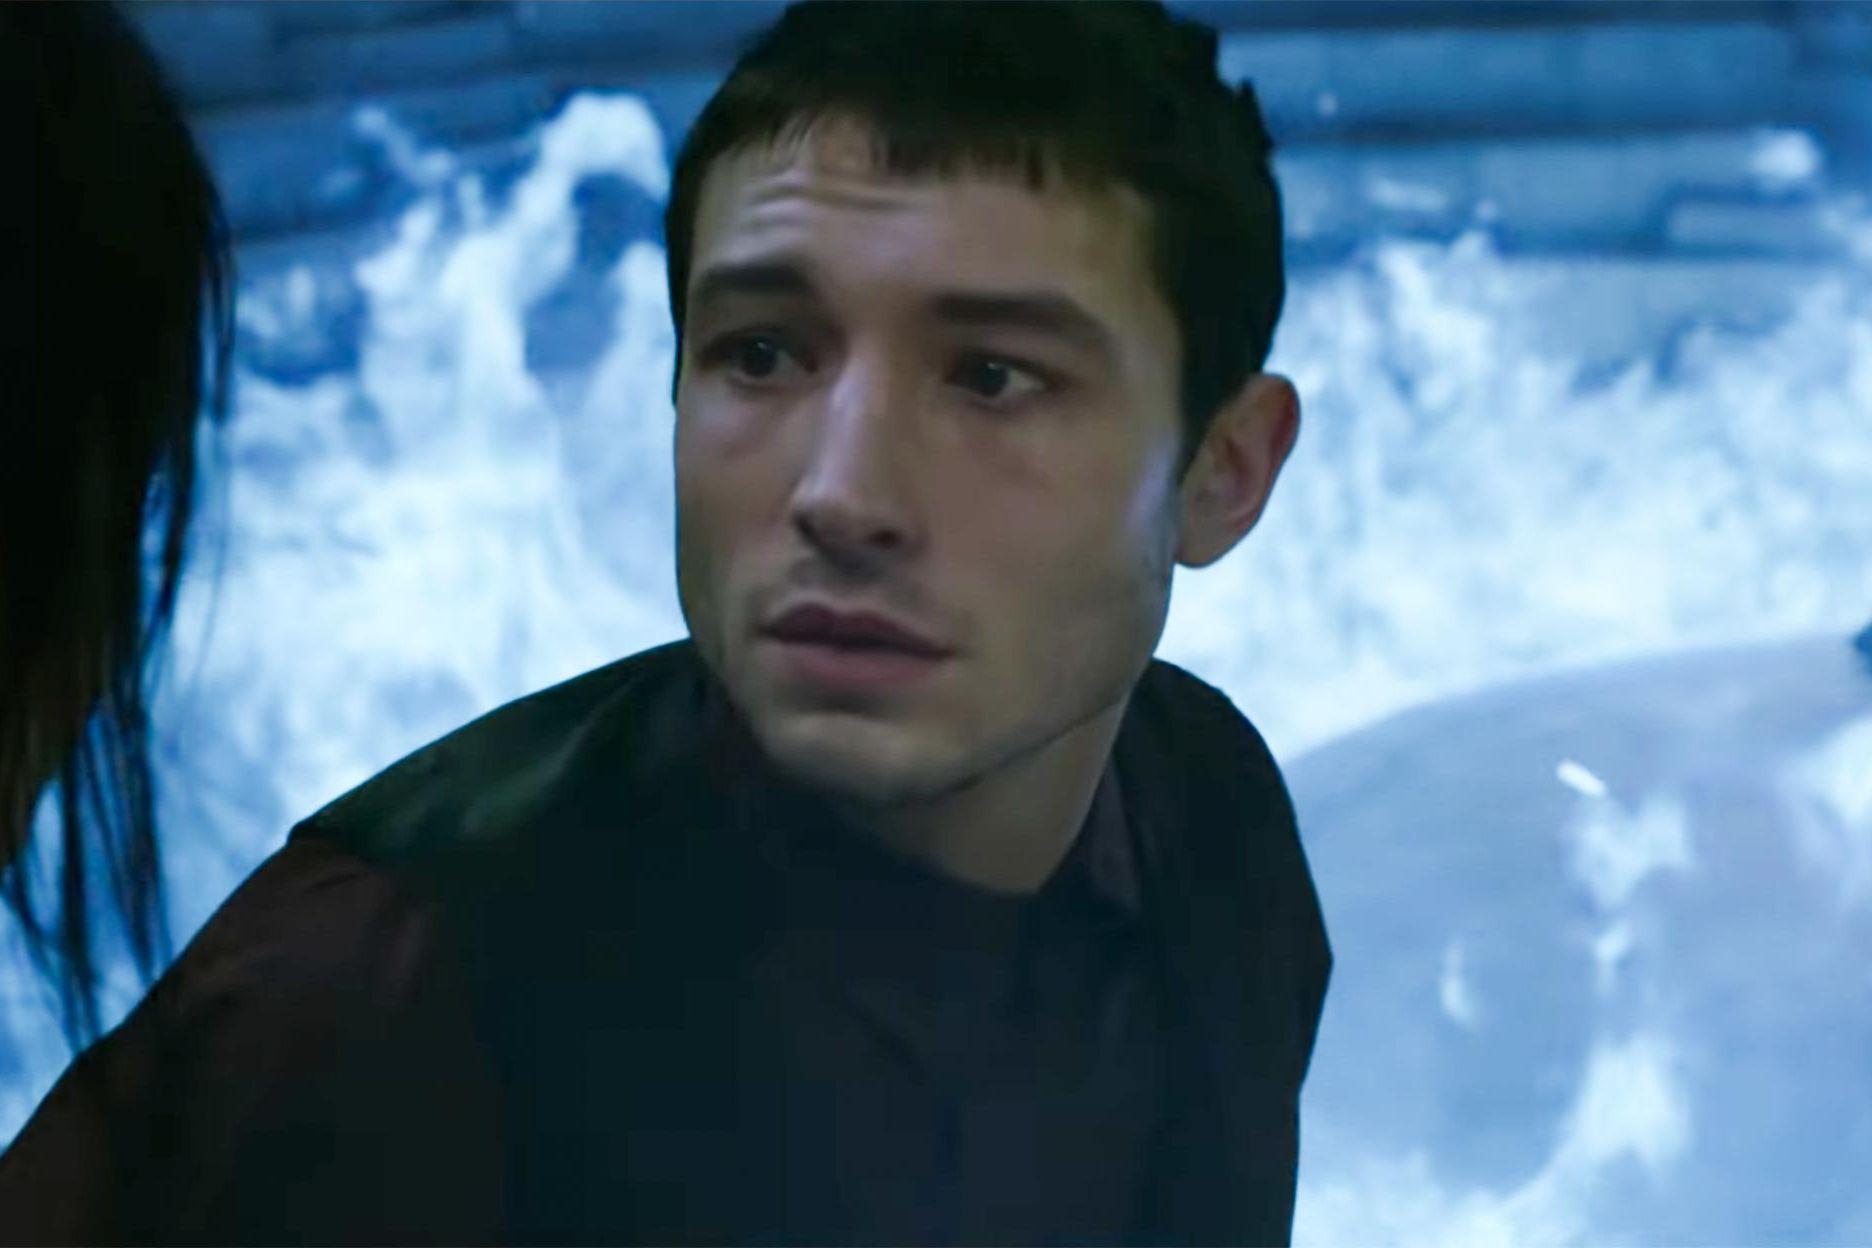 Ezra Miller as Credence Barebone in Fantastic Beasts The Crimes of Grindelwald